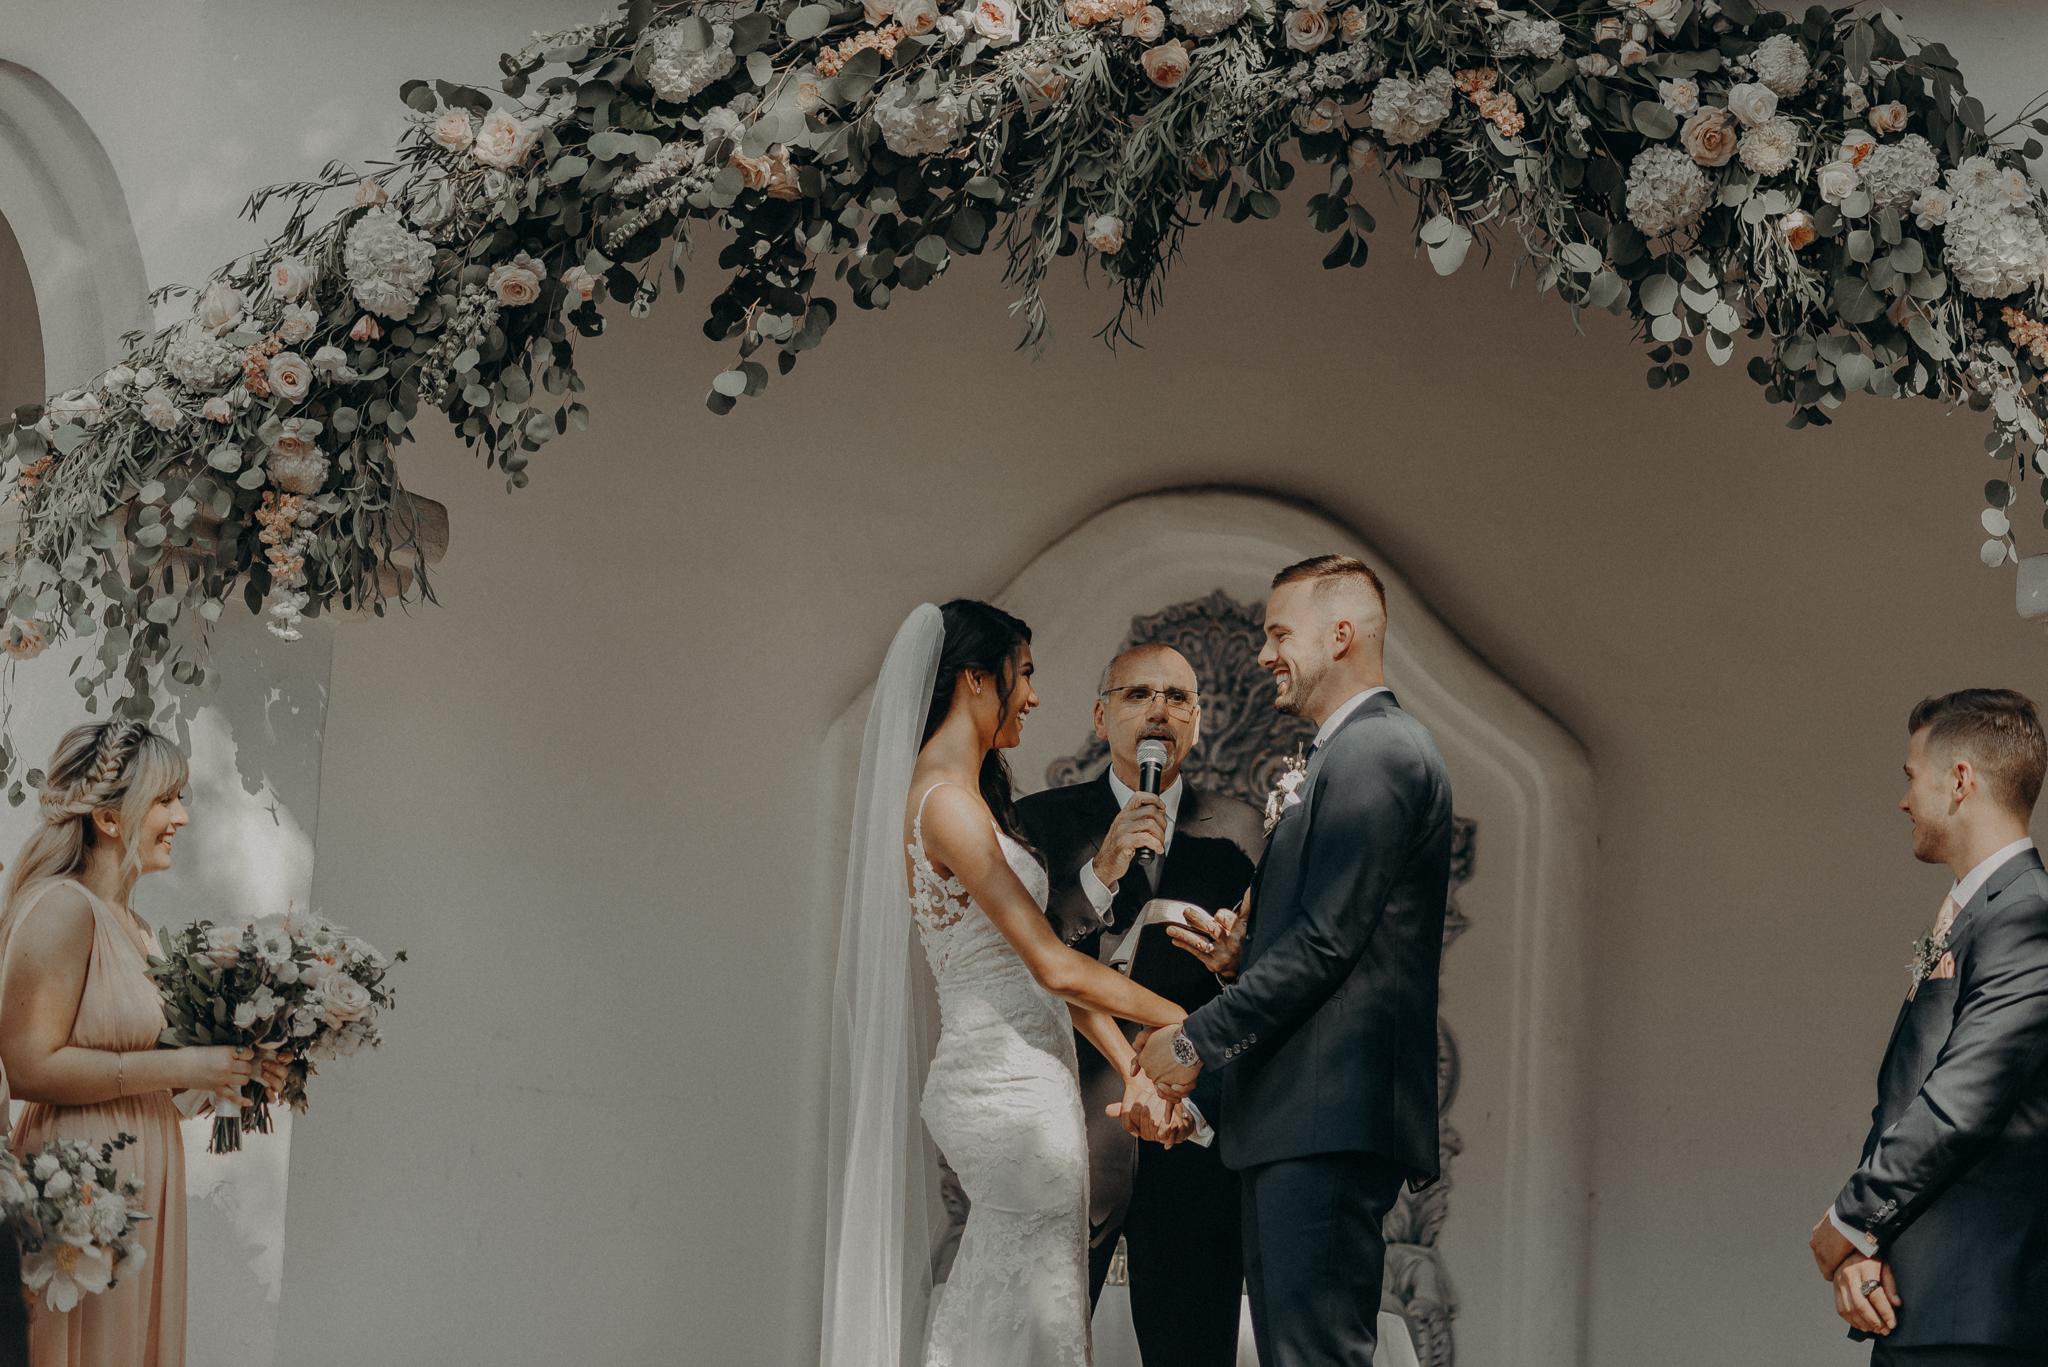 Isaiah + Taylor Photography - Rancho Las Lomas Wedding, Los Angeles Wedding Photographer-061.jpg